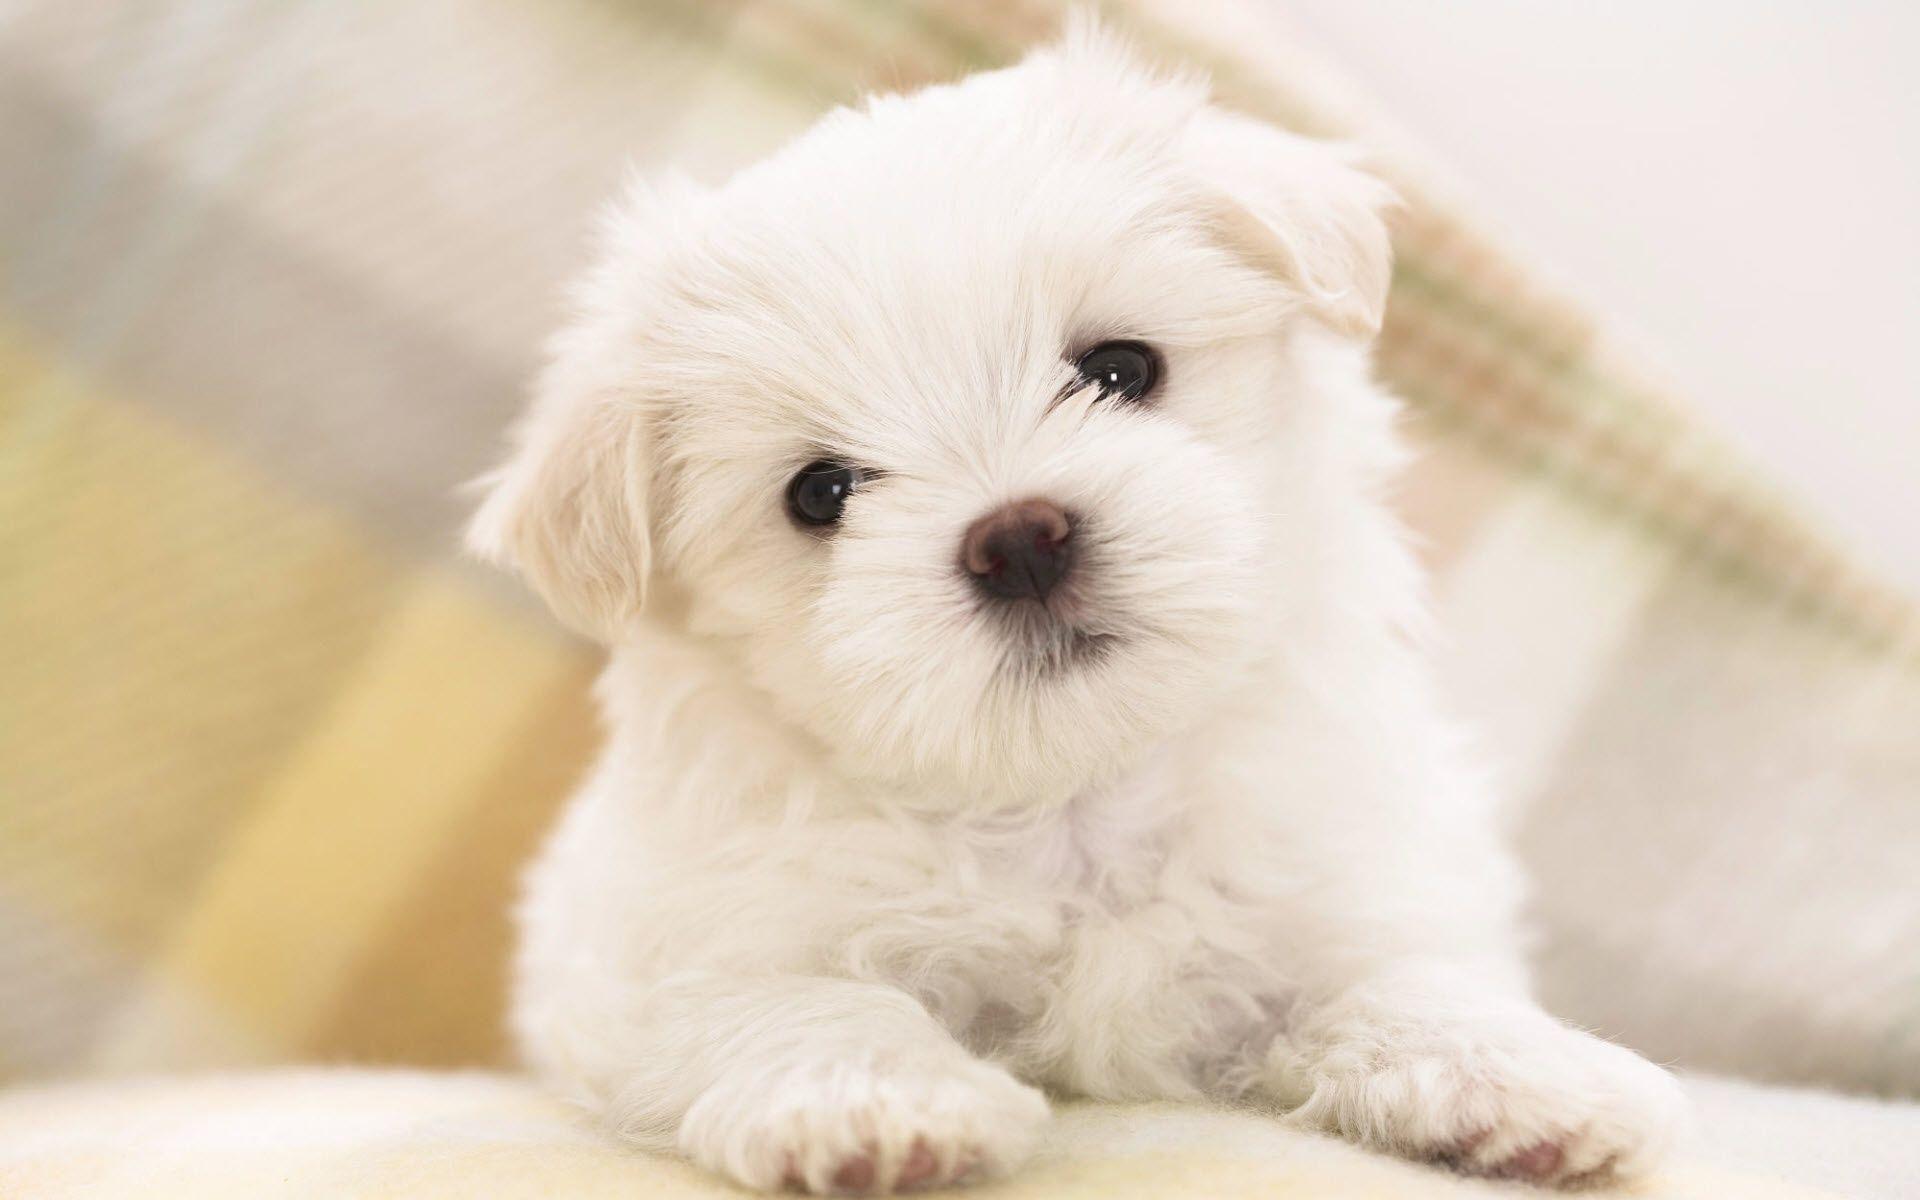 1920x1200 maltese puppy animal wallpaper | Desktop Backgrounds for Free HD .